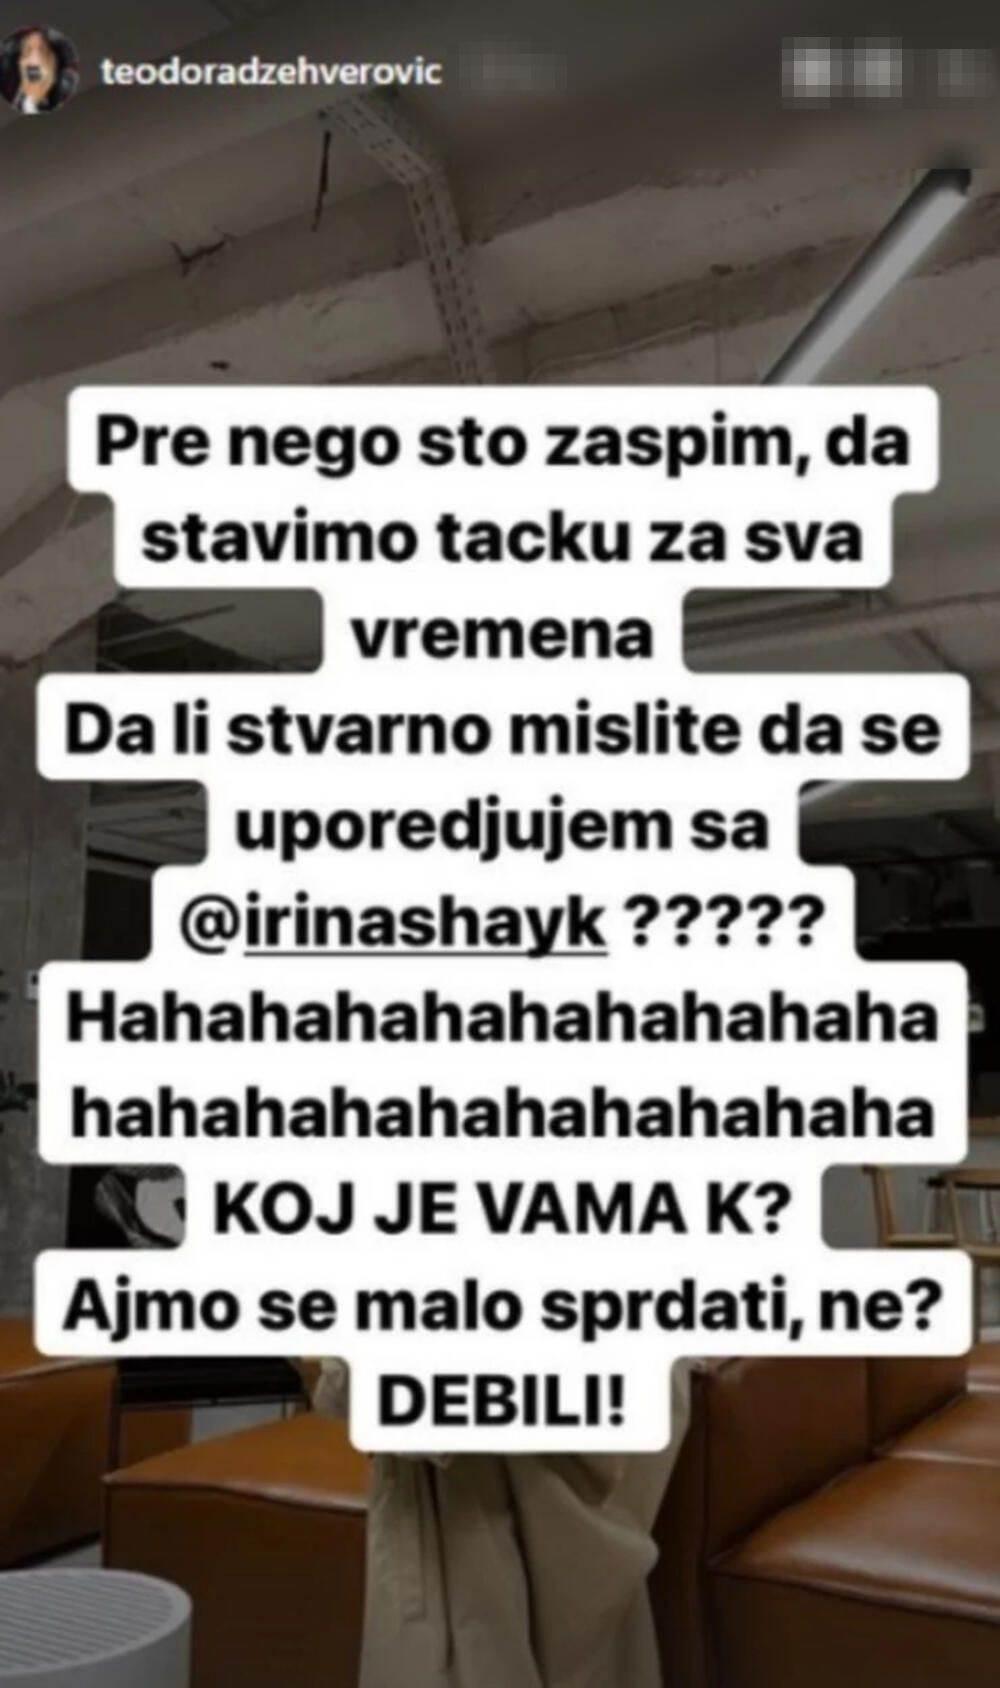 Teodora Džehverović burno reagovala